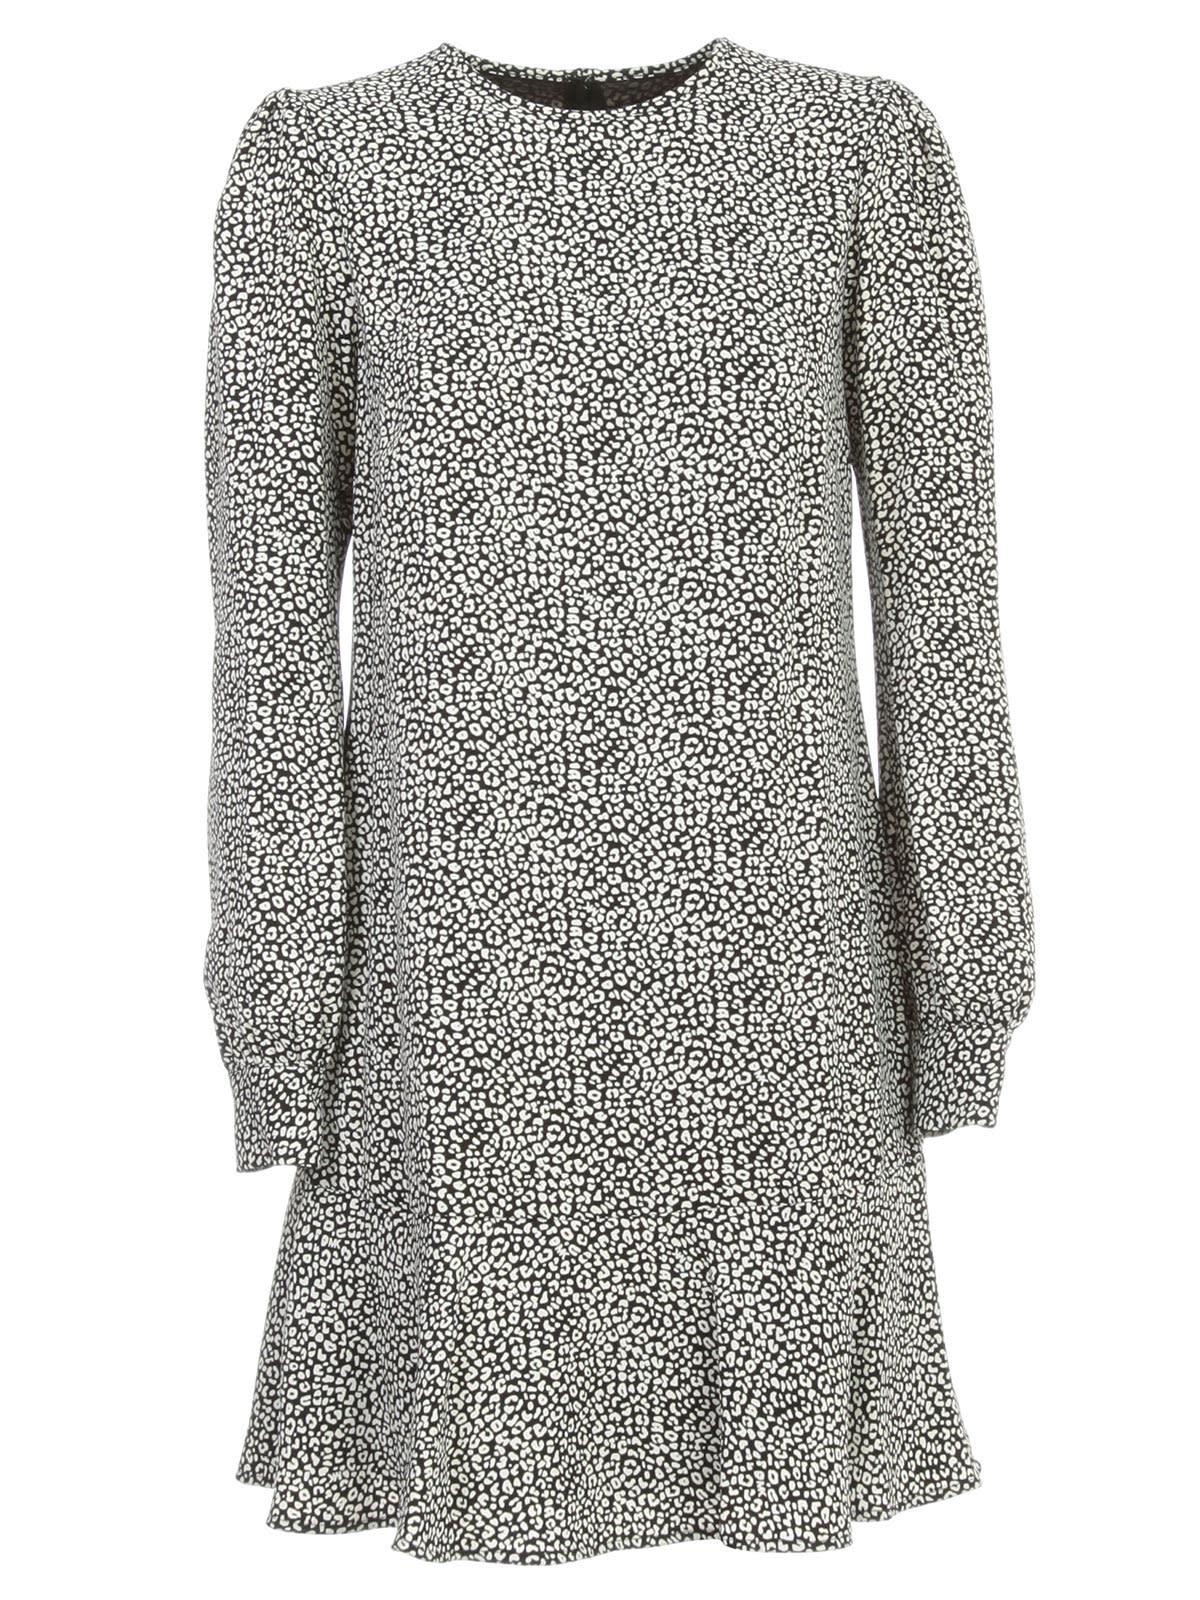 Buy MICHAEL Michael Kors Flat Babycat Dress L/s Crew Neck W/print online, shop MICHAEL Michael Kors with free shipping